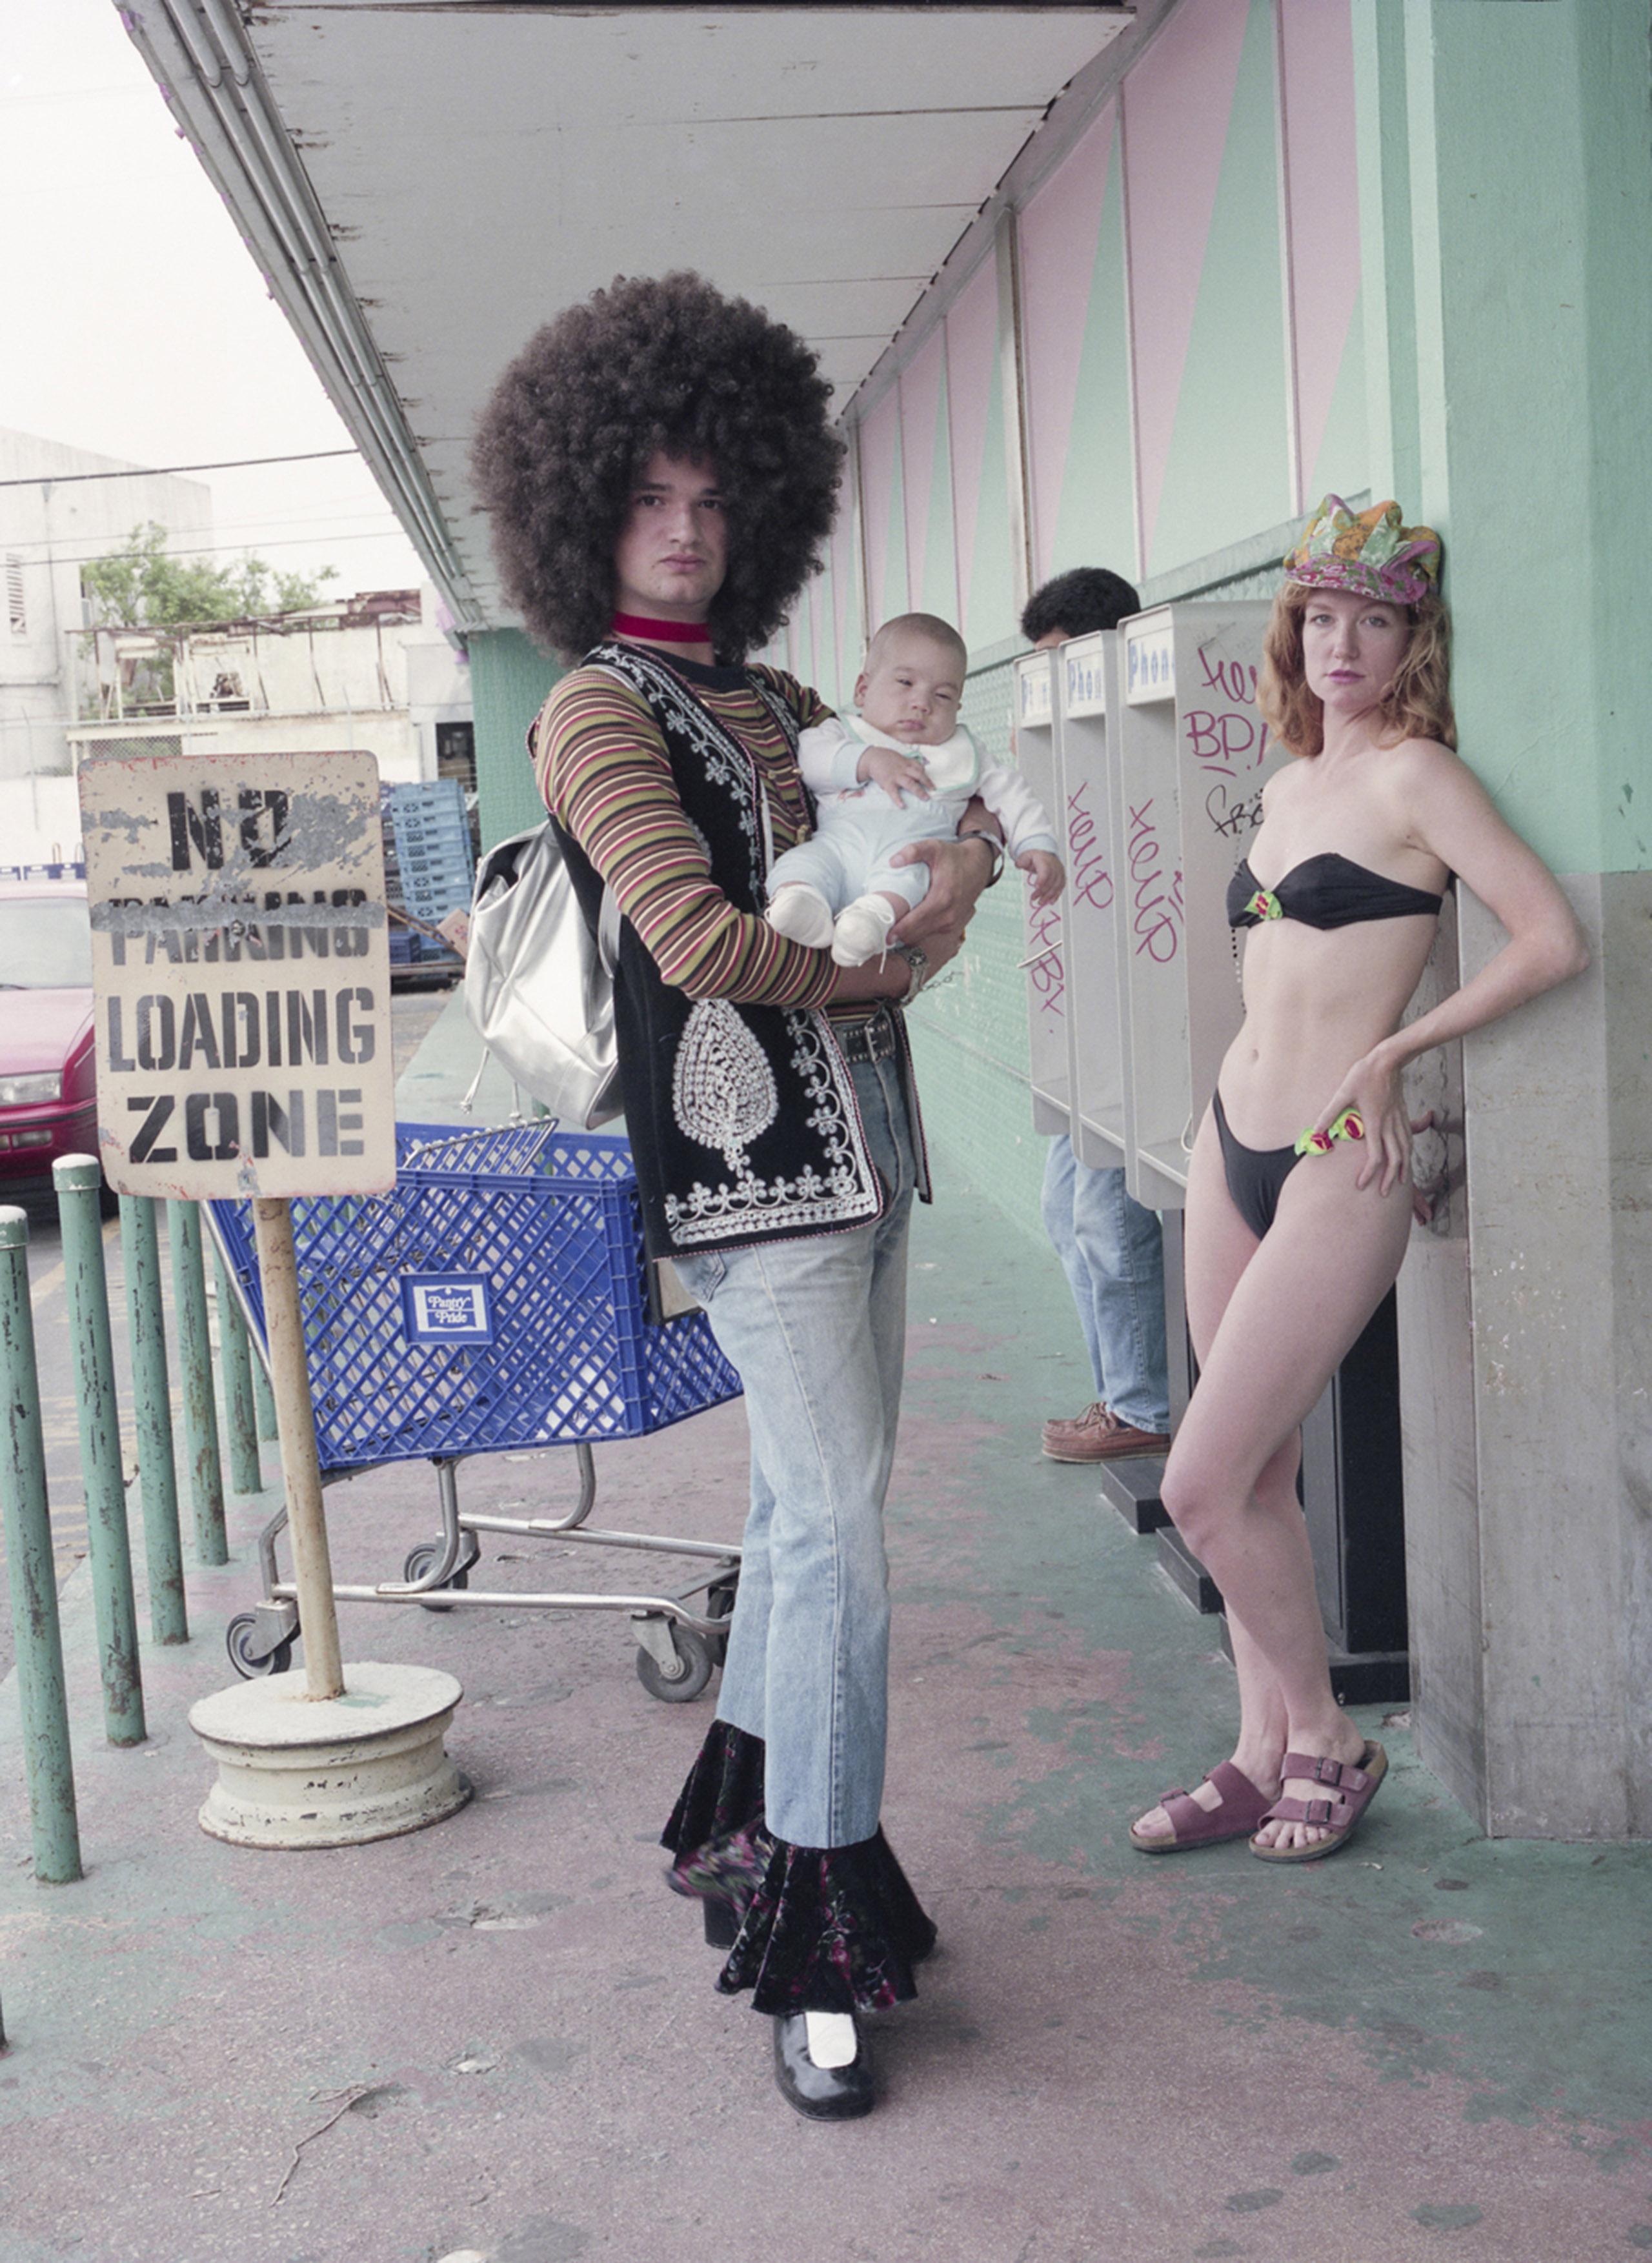 Miami Herald Tropic Magazine Color Photos 1991-1996